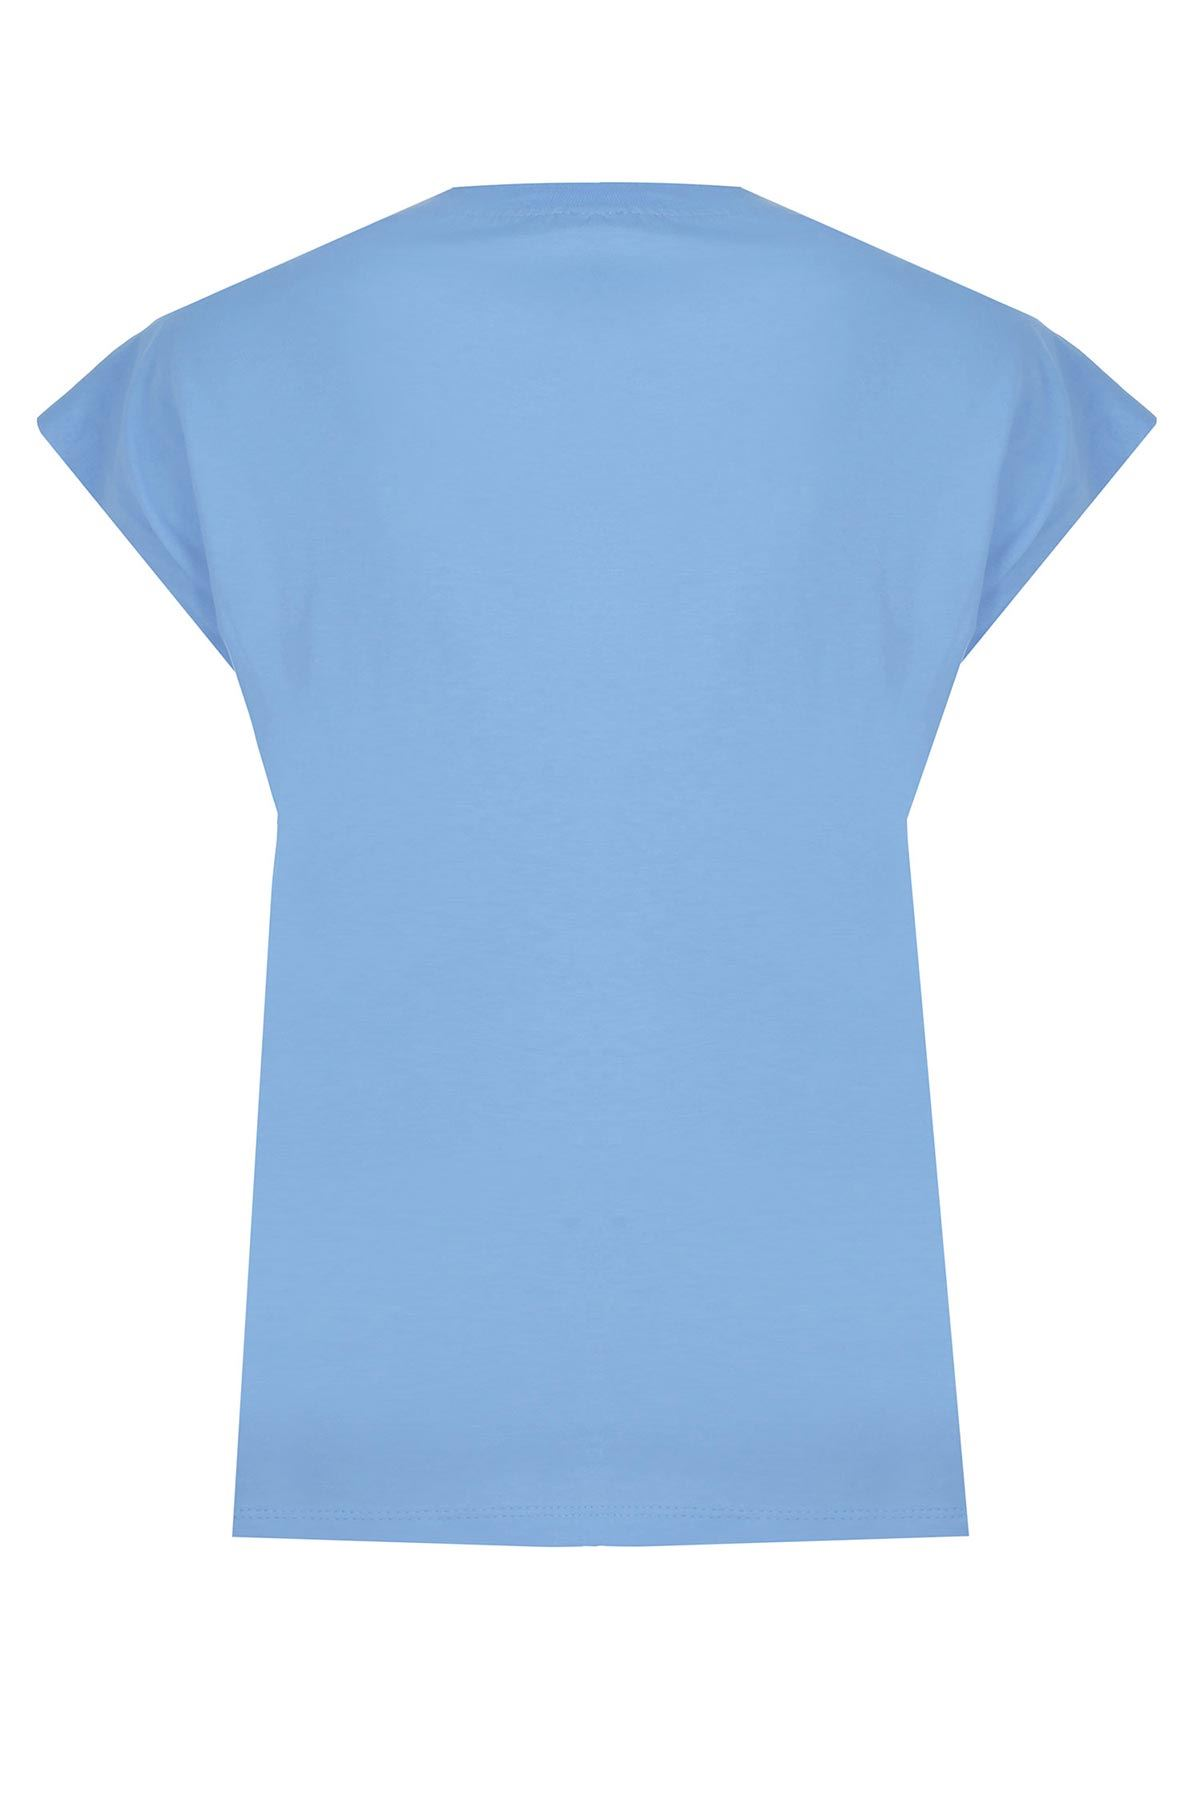 Kaplan desenli t-shirt Mavi